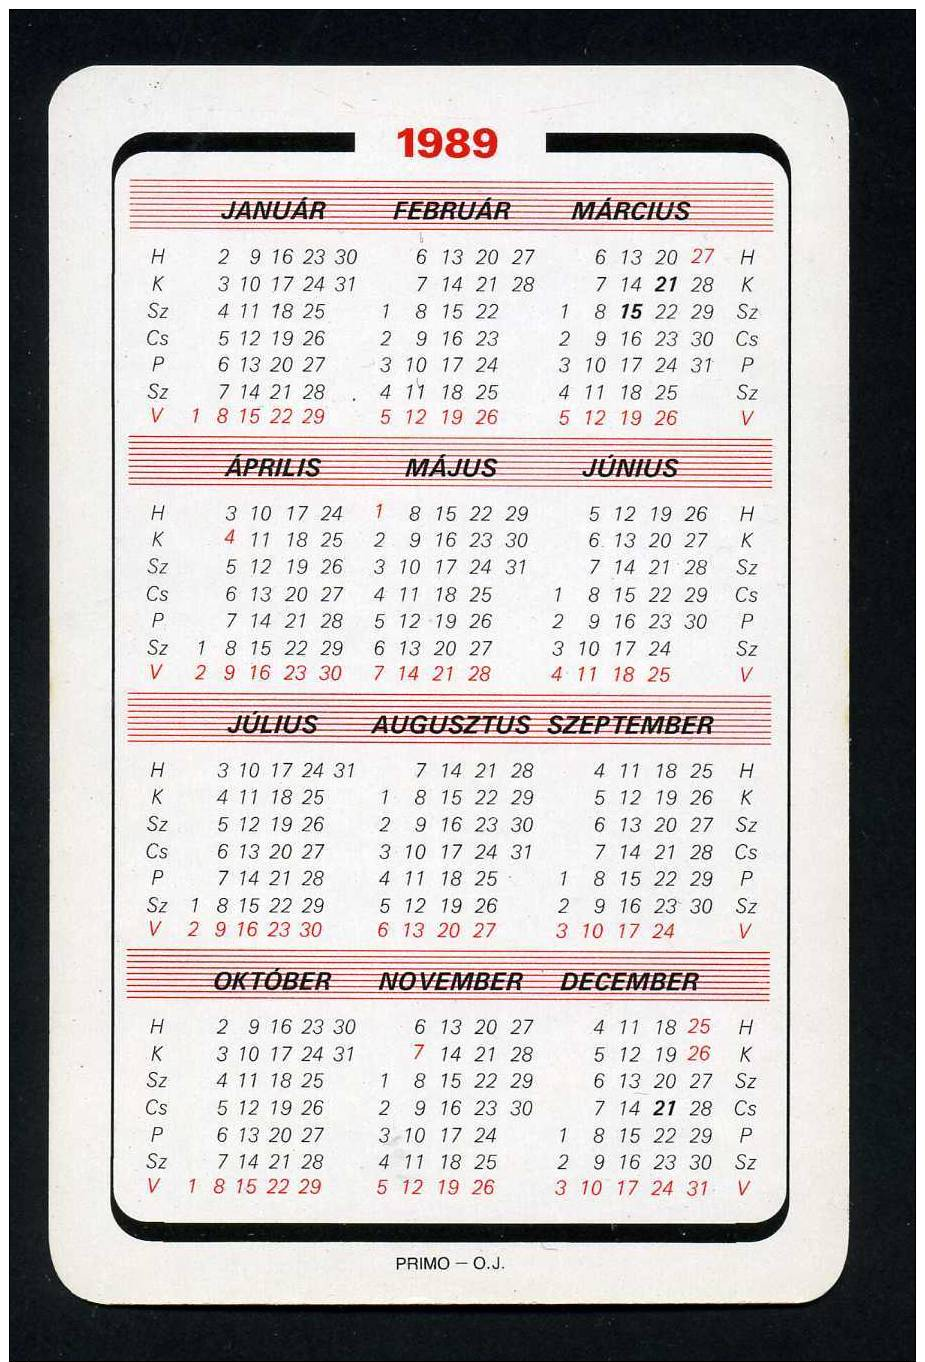 May Calendar Days : May fun calendar days foto bugil bokep